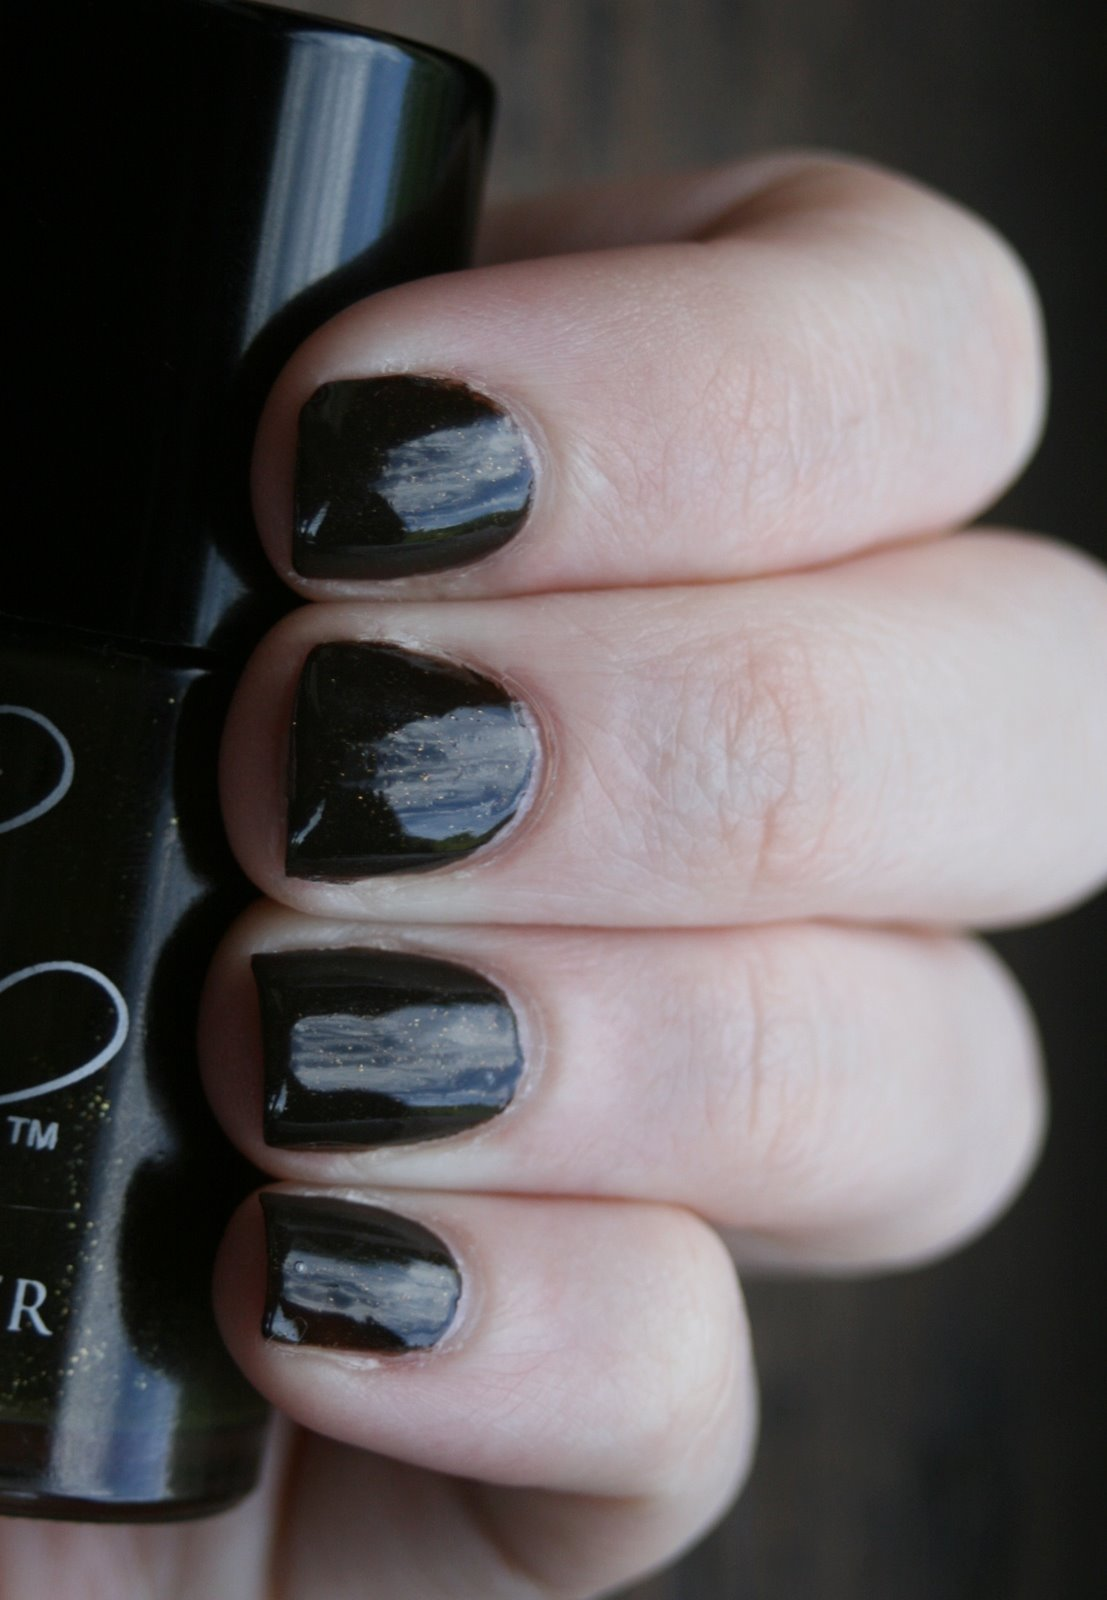 Cult Nails Swanborne Swatch